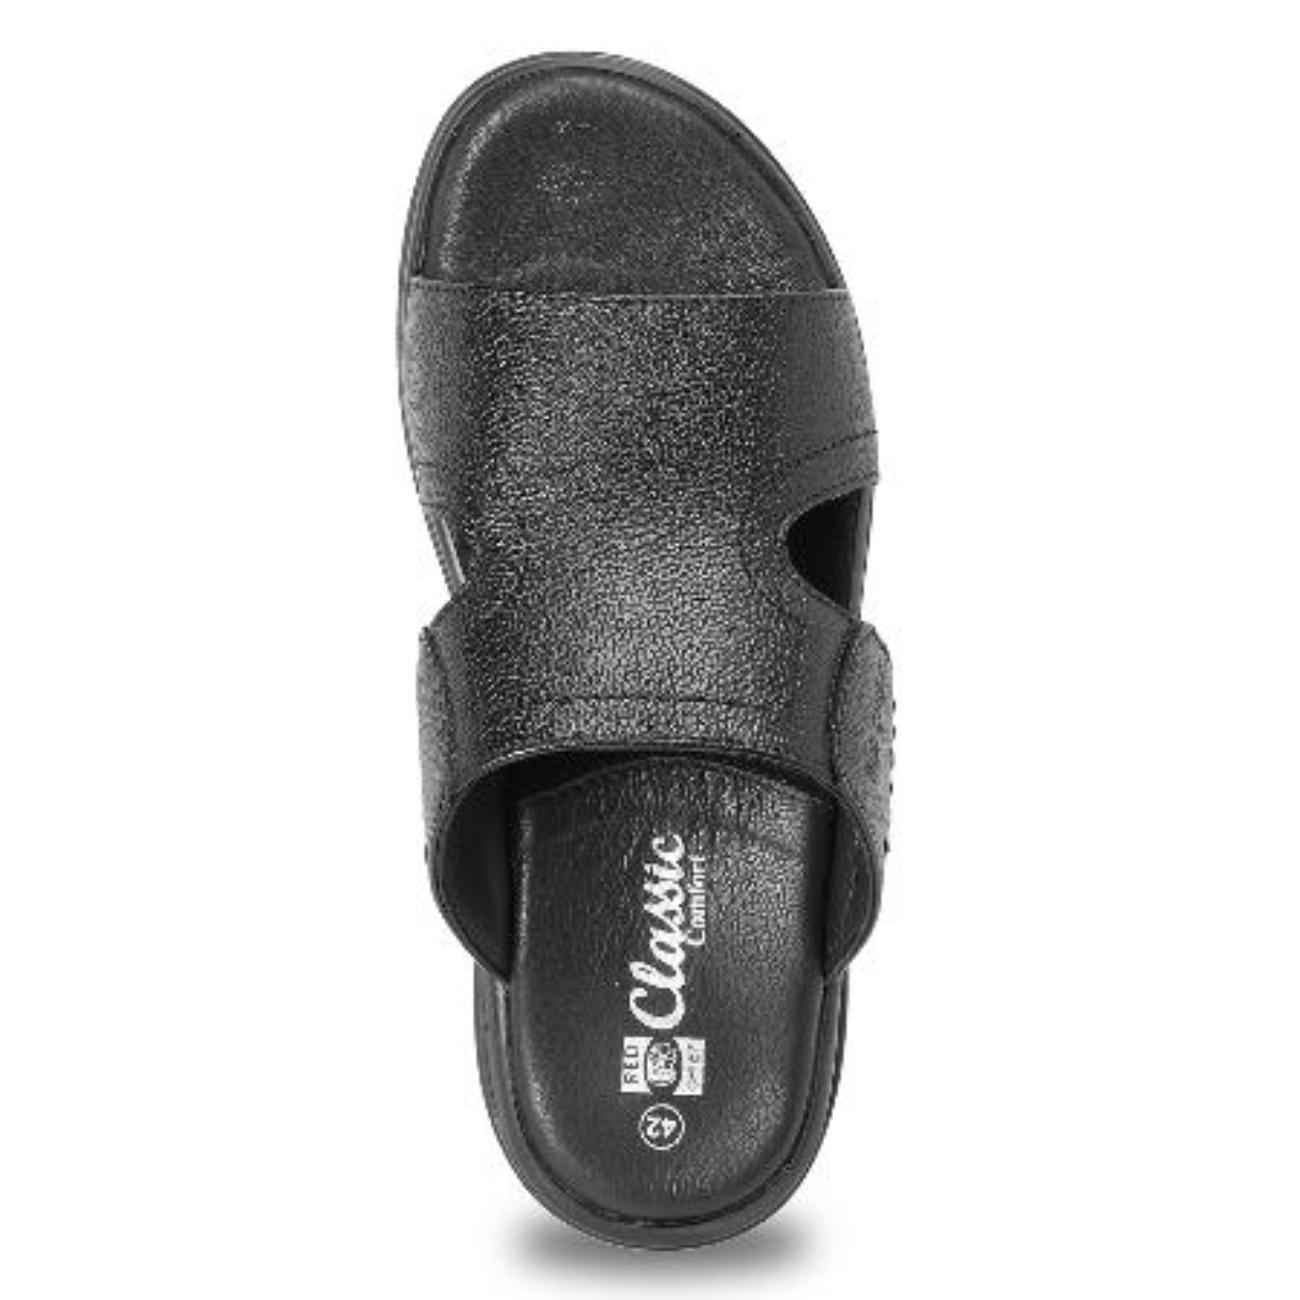 black slip-on sandals top view